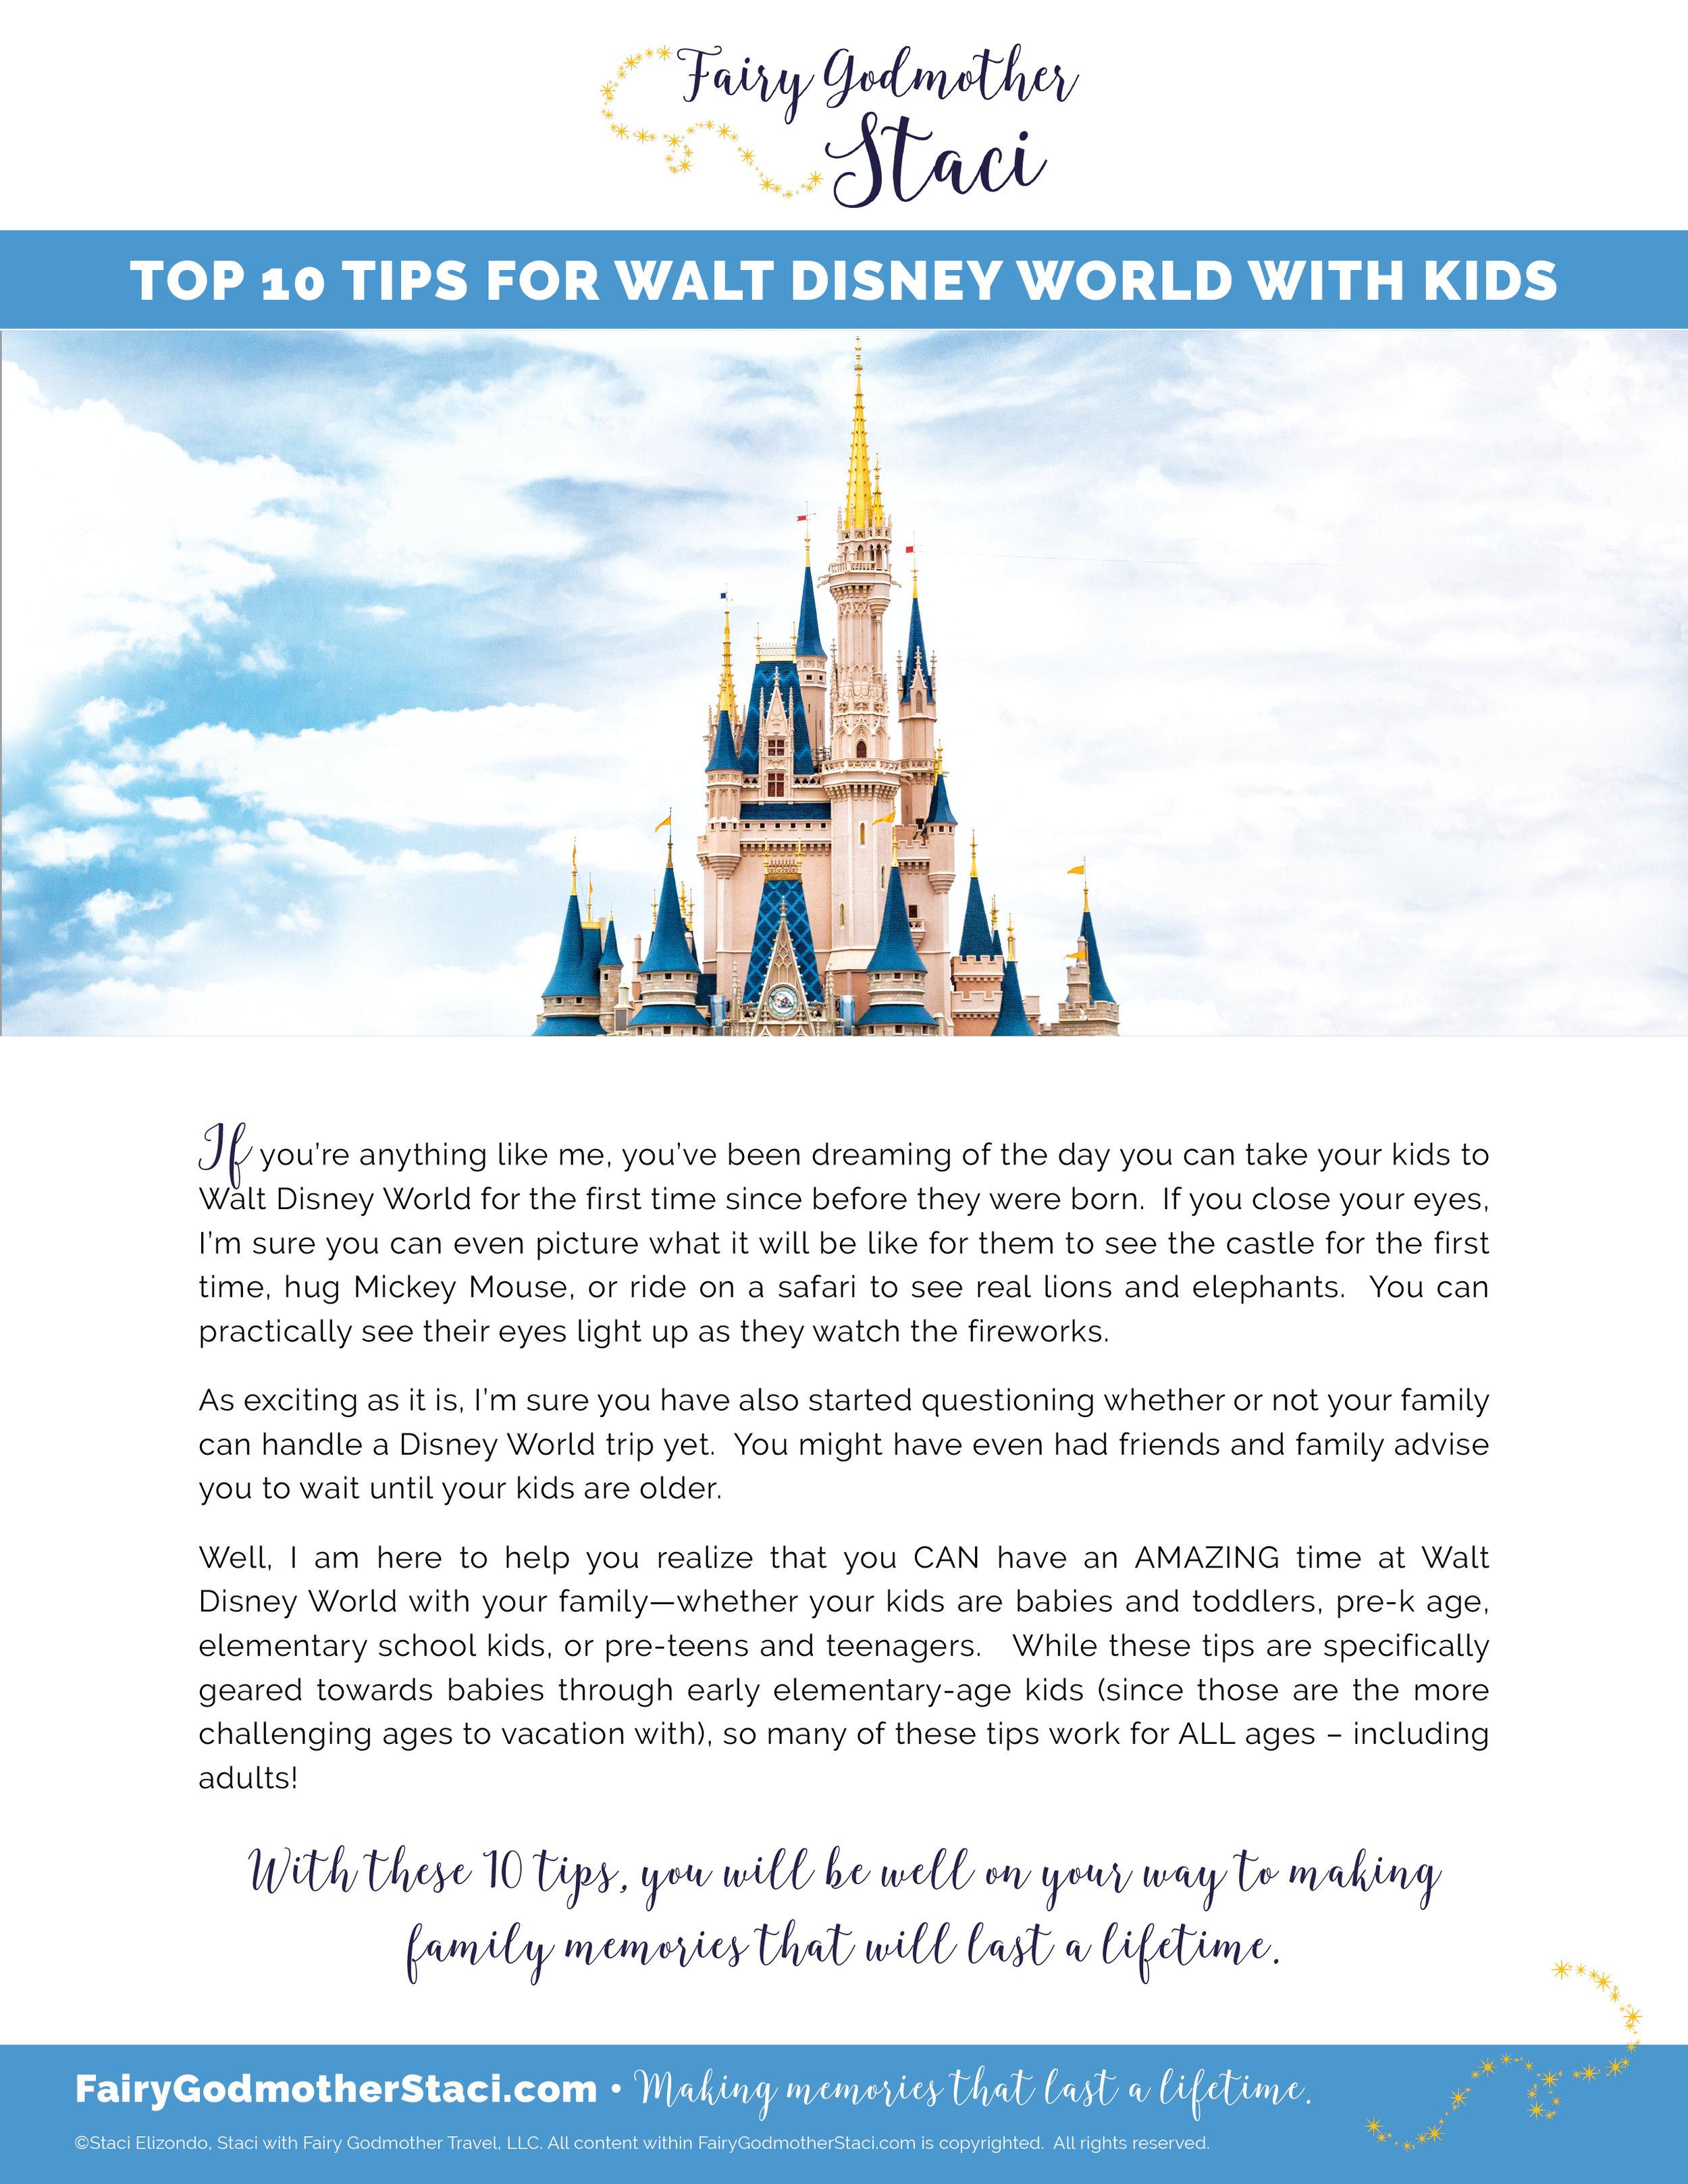 Top 10 Tips for Walt Disney World with Kids.jpg